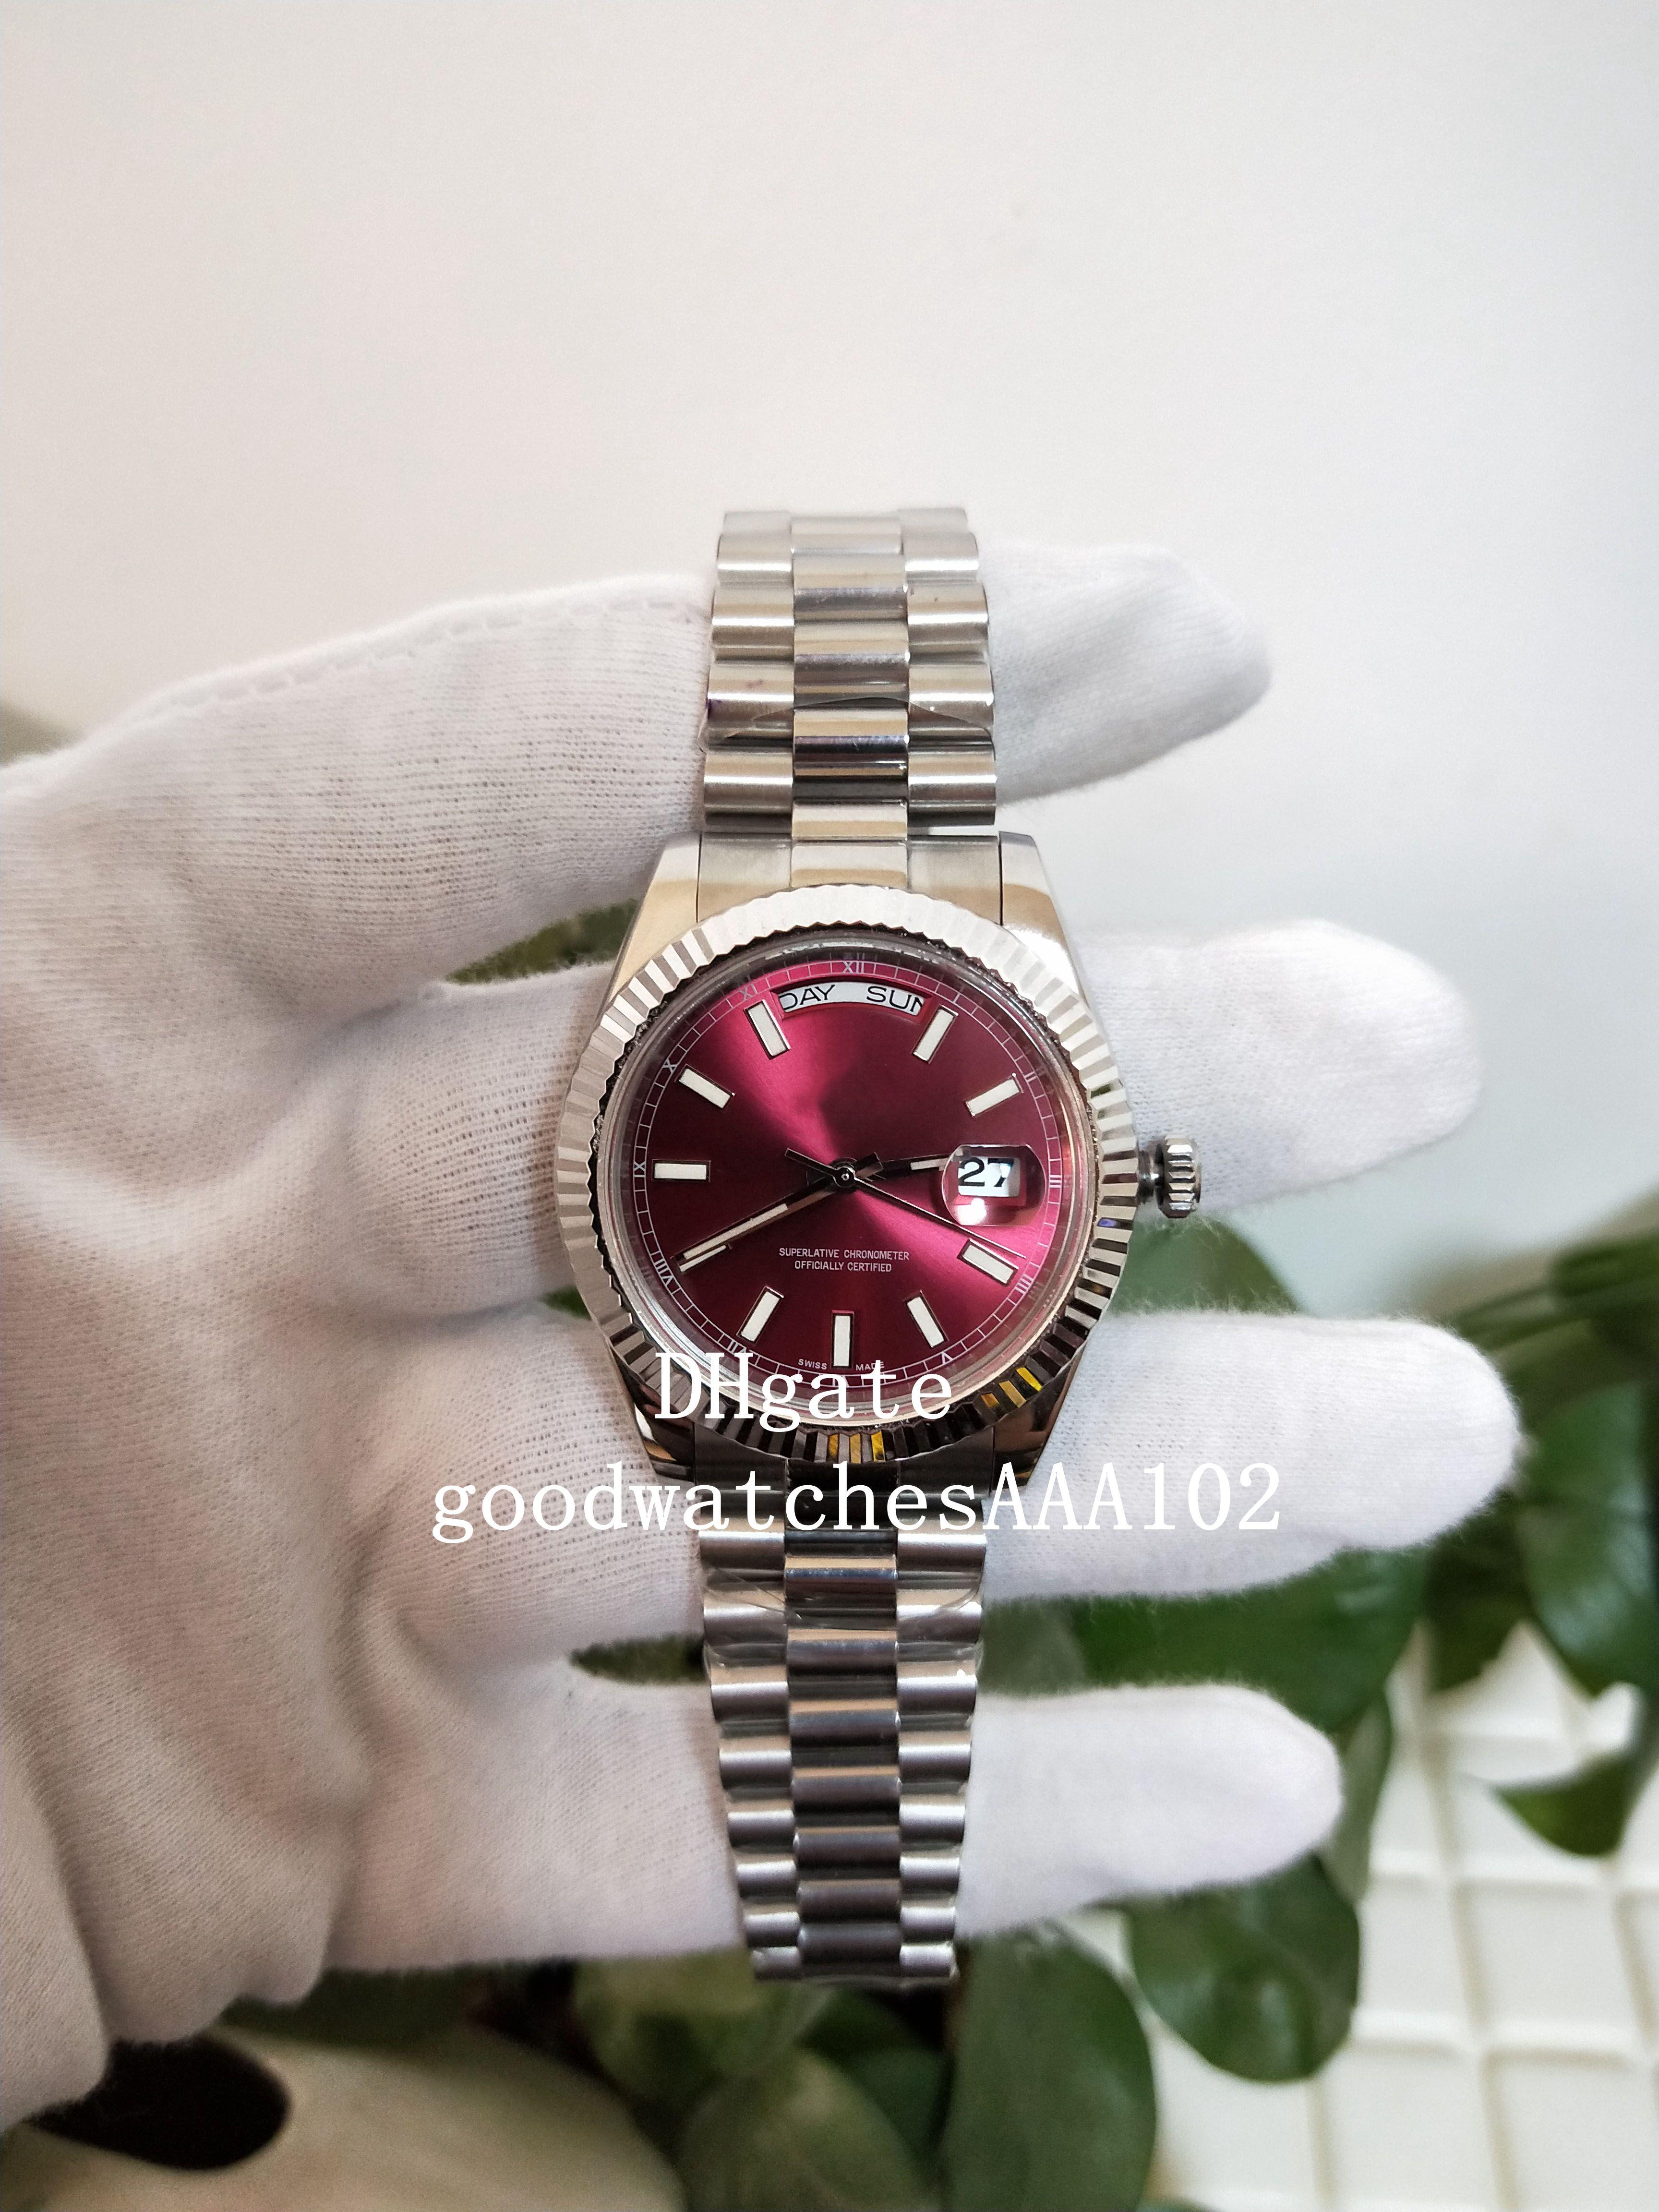 Homens Series de relógio clássico Relógios Datejust BP 2813 40 milímetros 36 milímetros Red Dial Sapphire 126333 228238 Excelente Mens Automatic Watch Watches